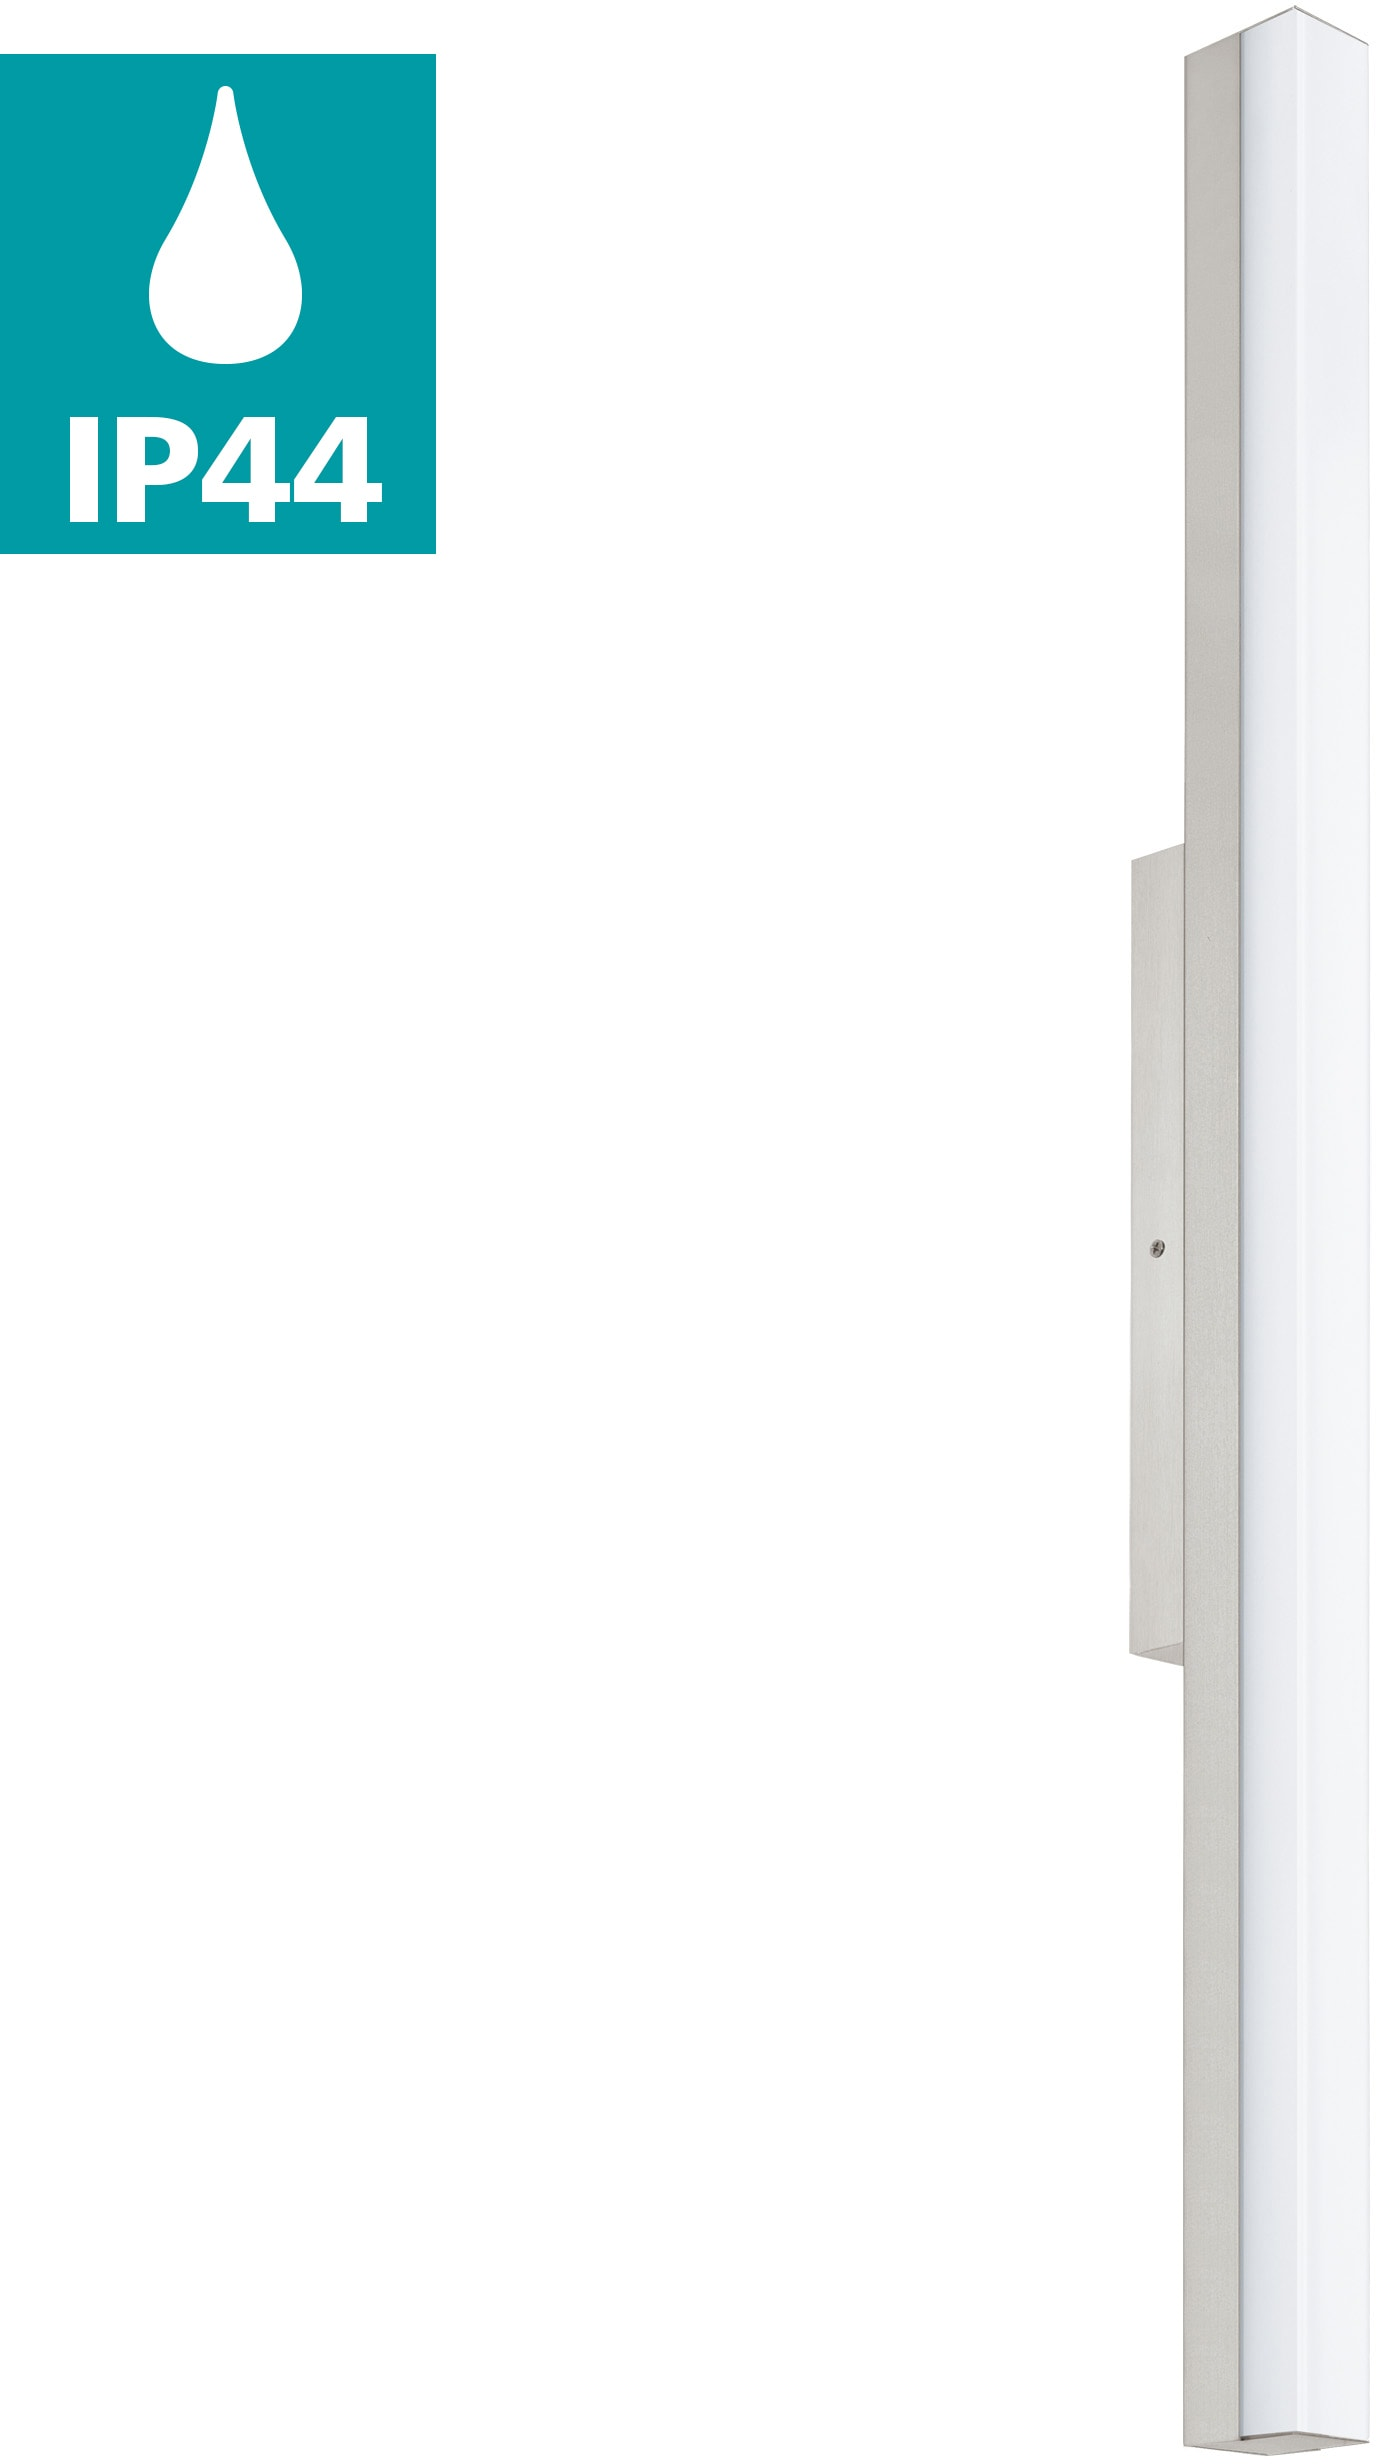 EGLO LED Wandleuchte TORRETTA, LED-Board, Warmweiß